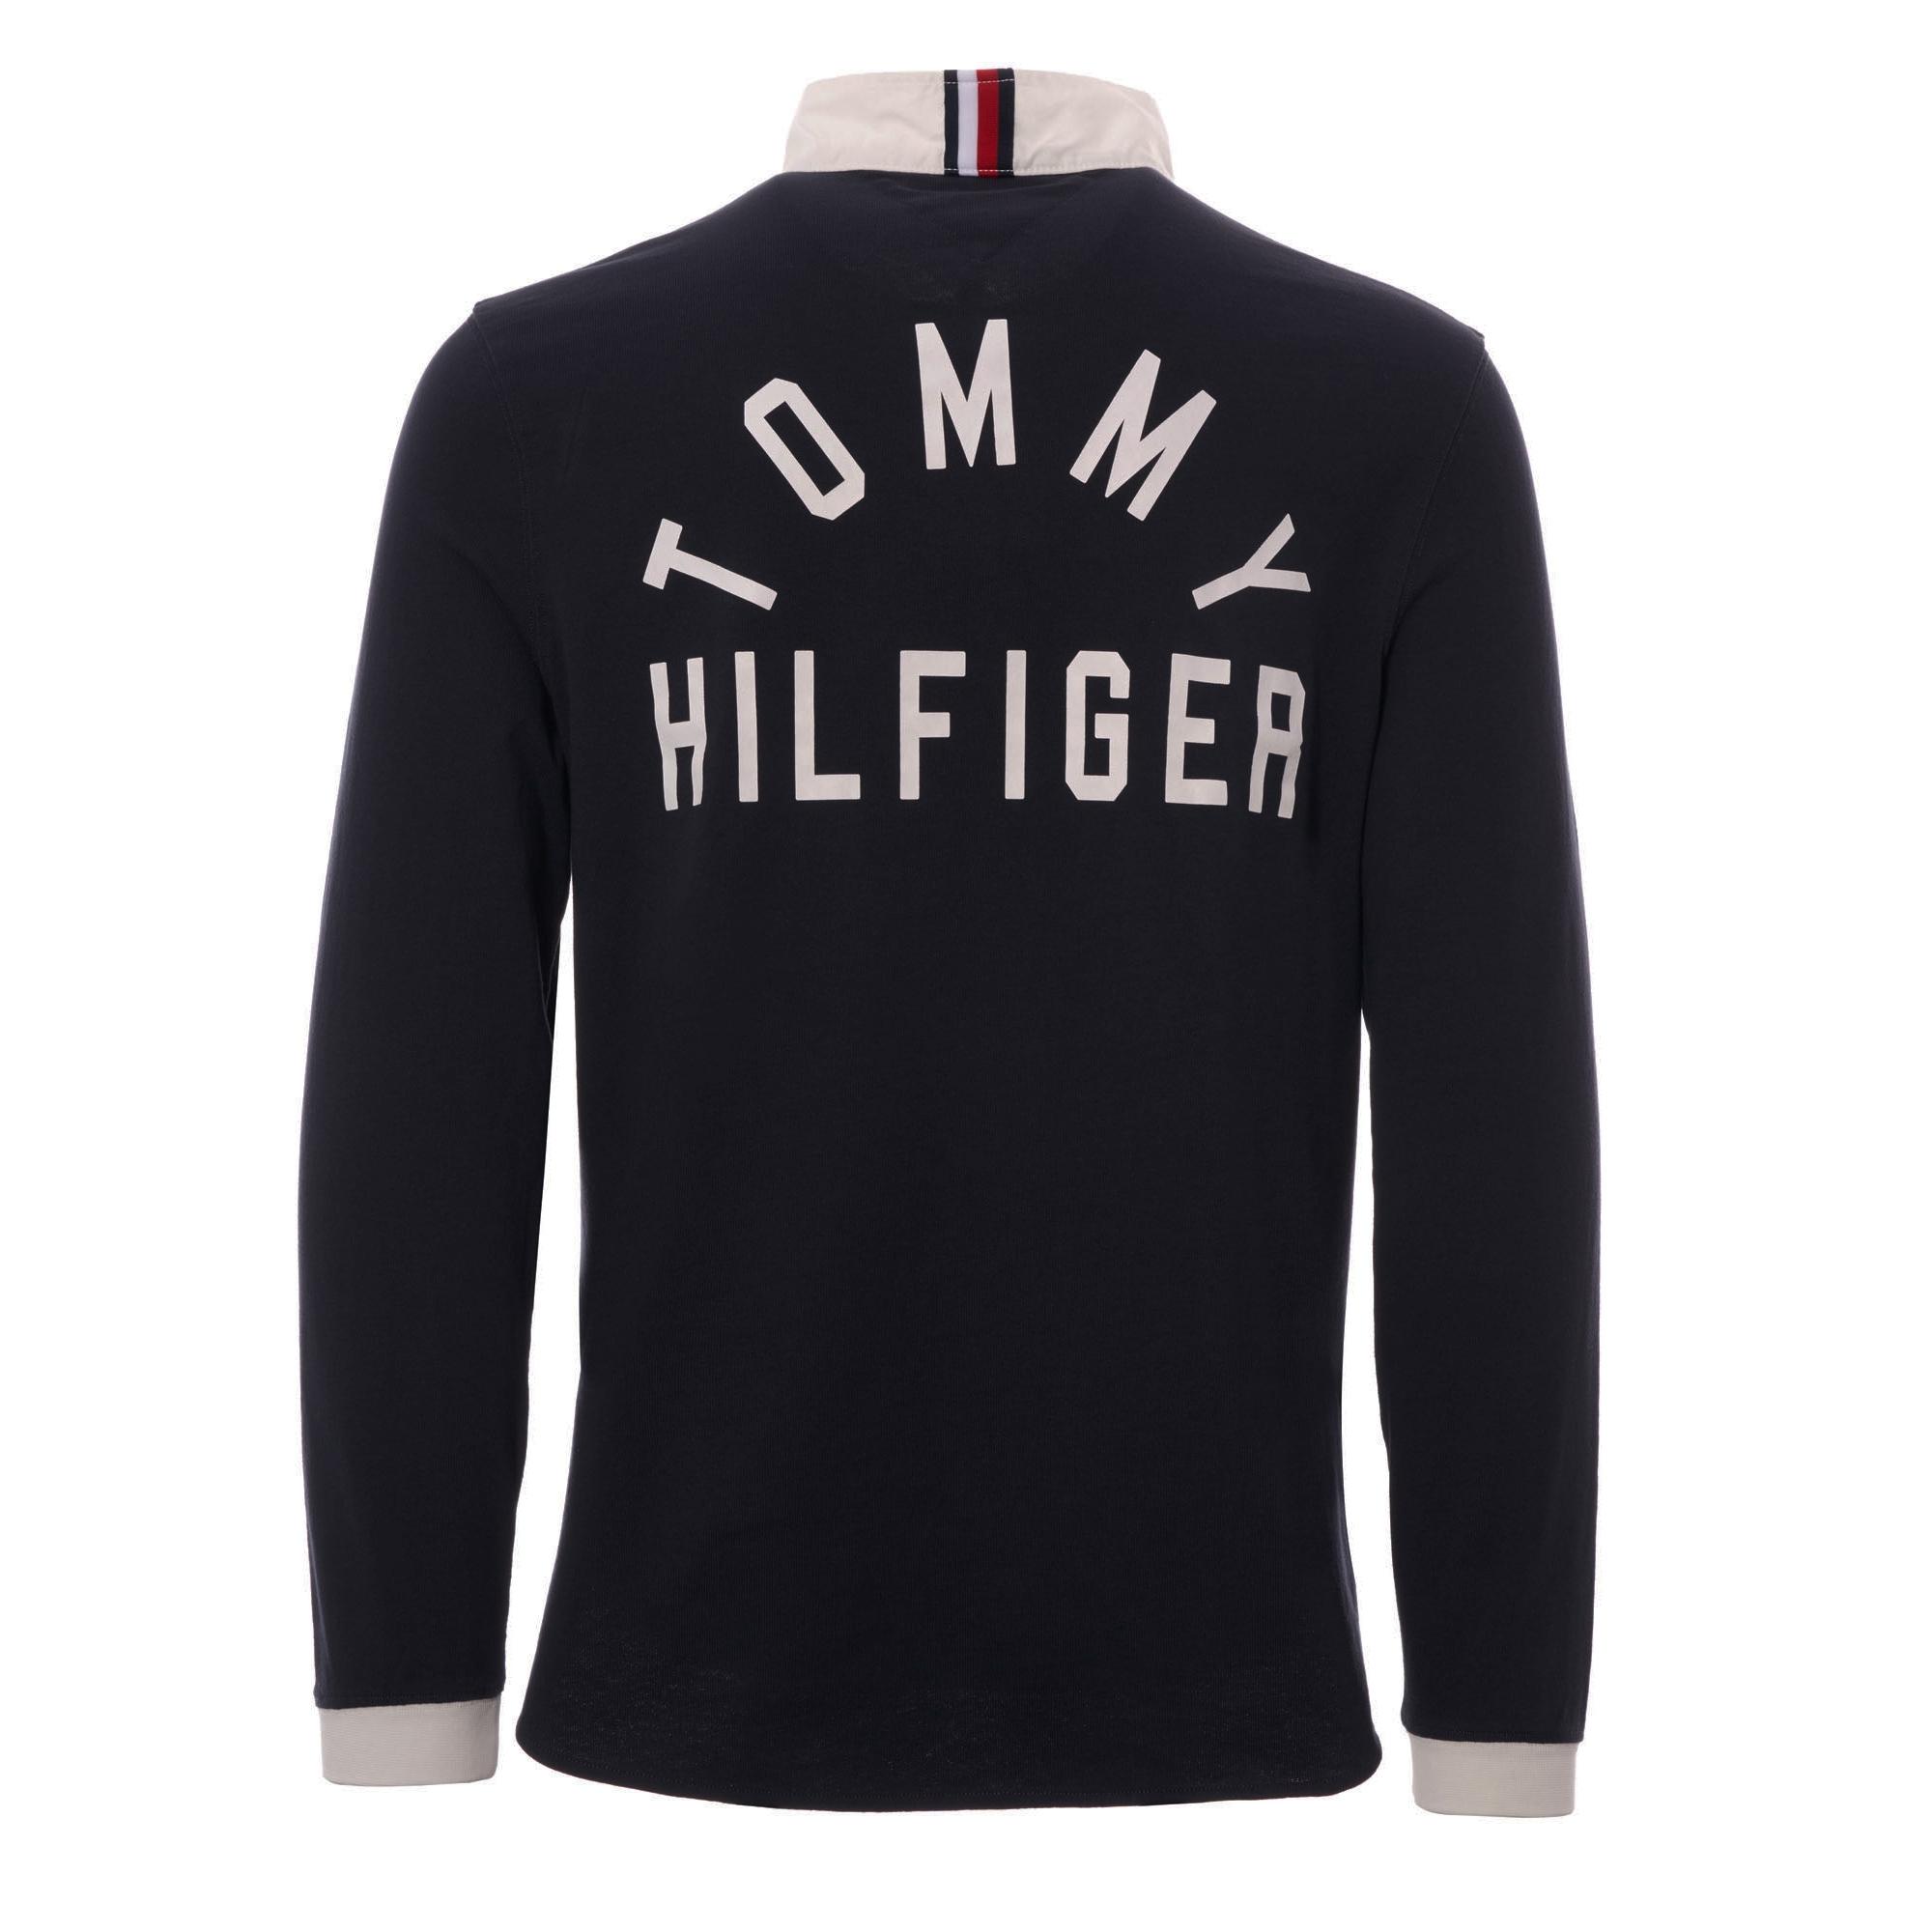 4bd319a7 Tommy Hilfiger (Sky Captain) Logo Rugby Shirt MW07973-403